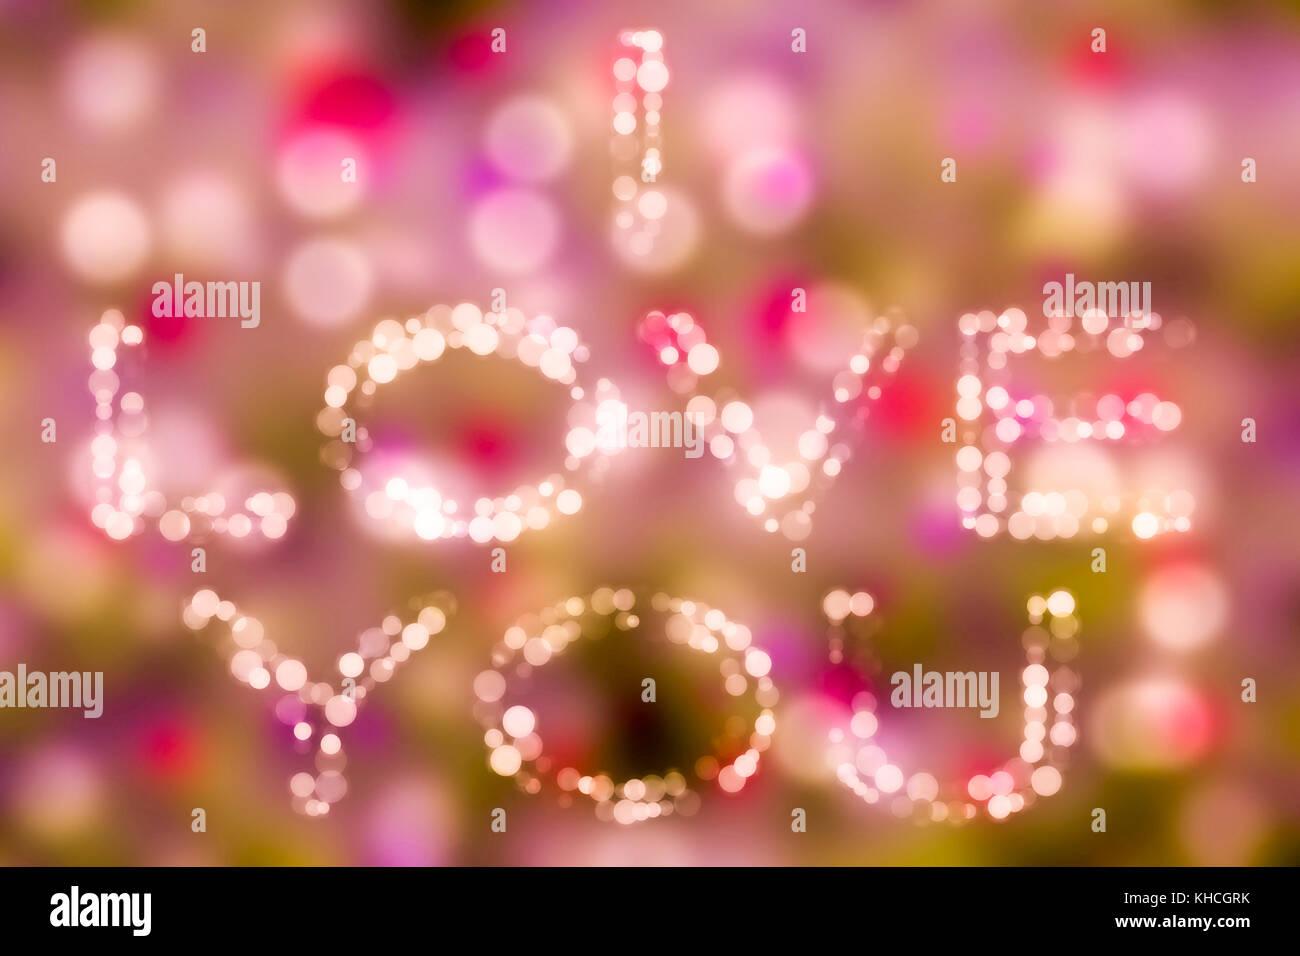 Love theme concept bokeh background i love you Valentine's